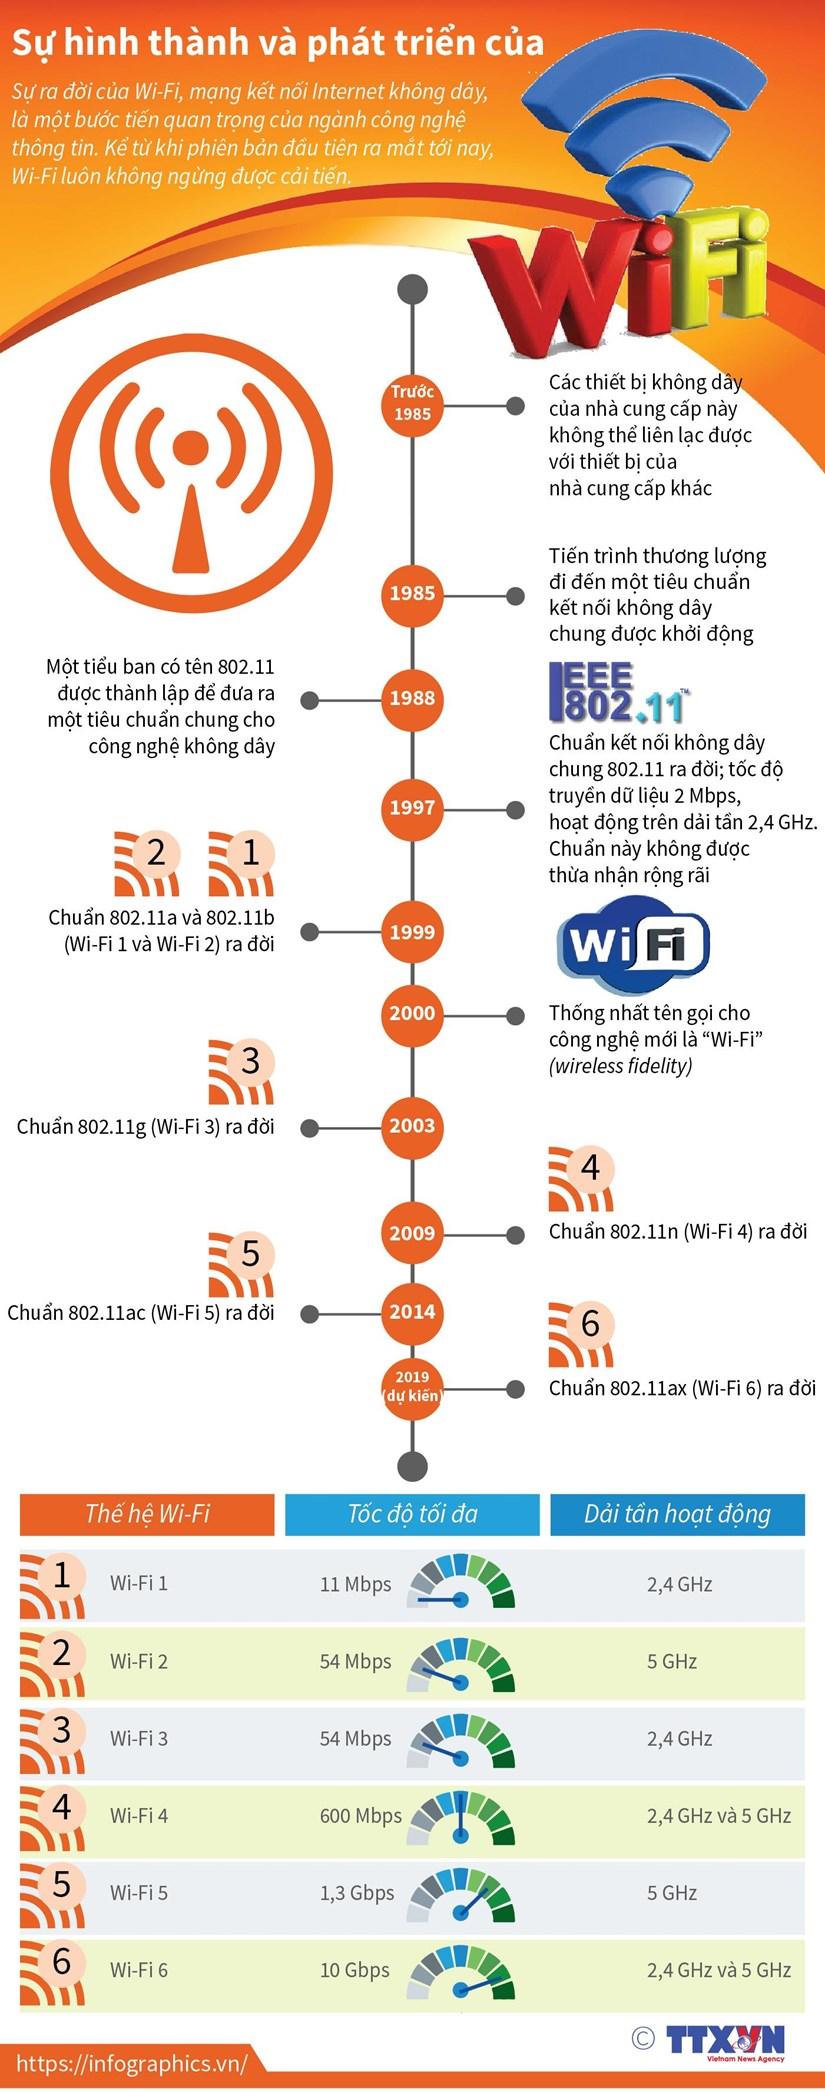 [Infographics] Su hinh thanh va phat trien cua Wi-Fi hinh anh 1